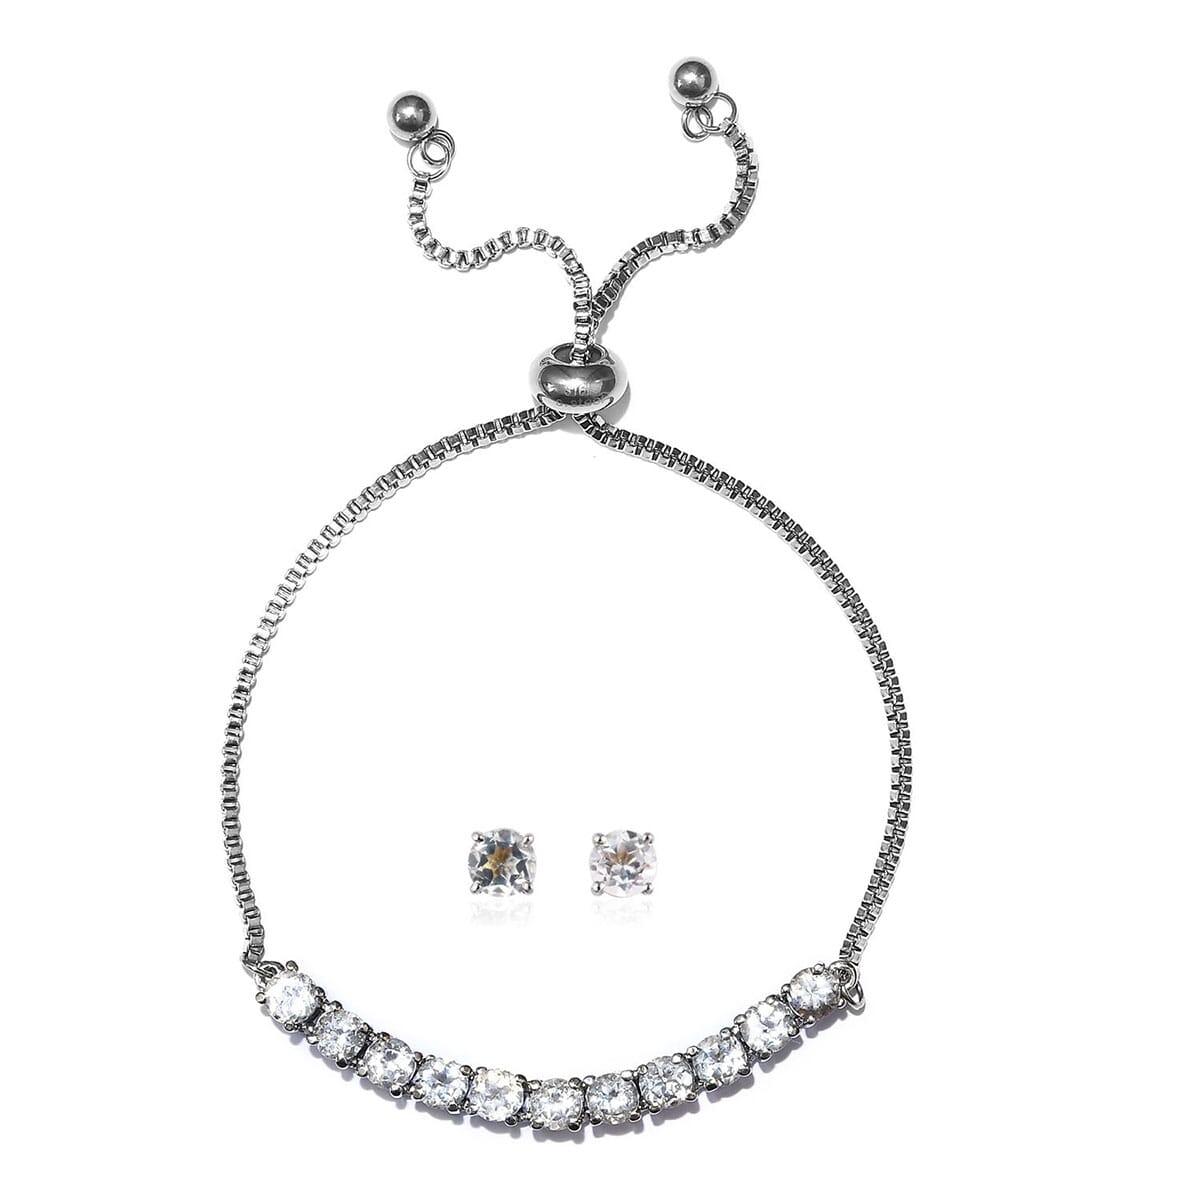 2b50cc7ec2268 Details about White Topaz Bolo Slider Bracelet Solitaire Earrings Set Steel  Jewelry